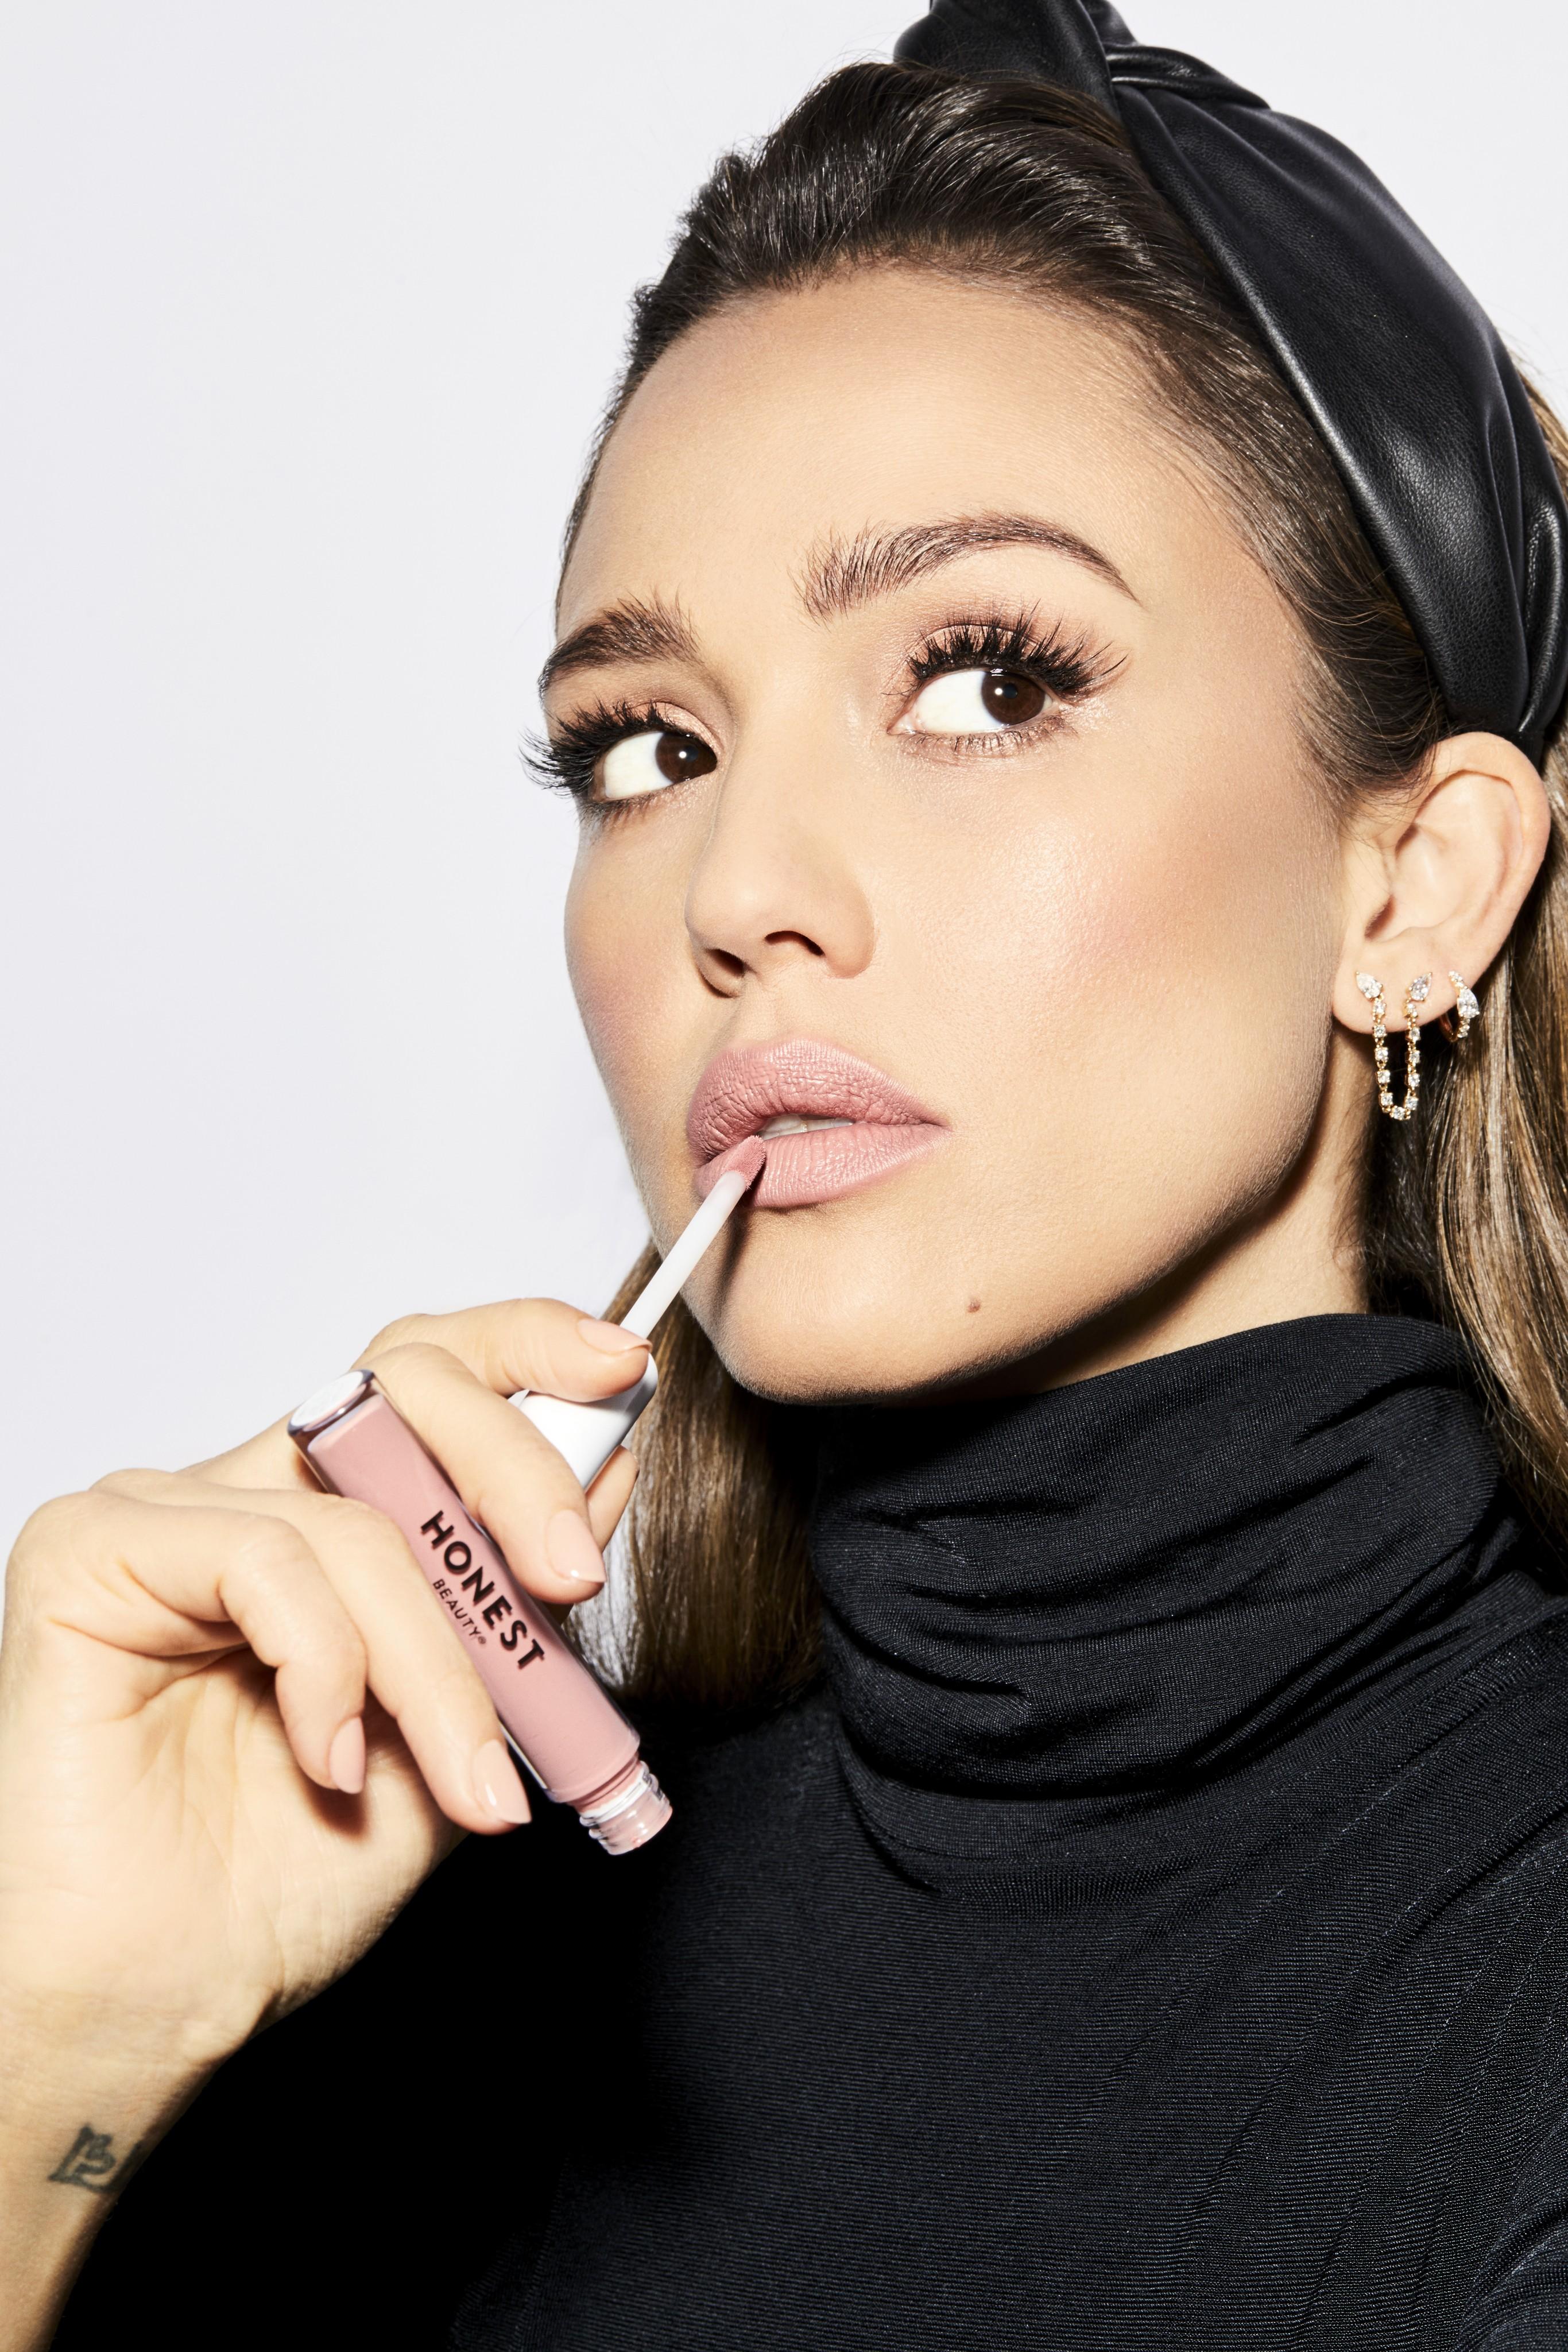 Makeup-beautyvisual-honestbeauty-jessica-alba-liquid-lipstick-offduty-1-1121-Web-Rendition